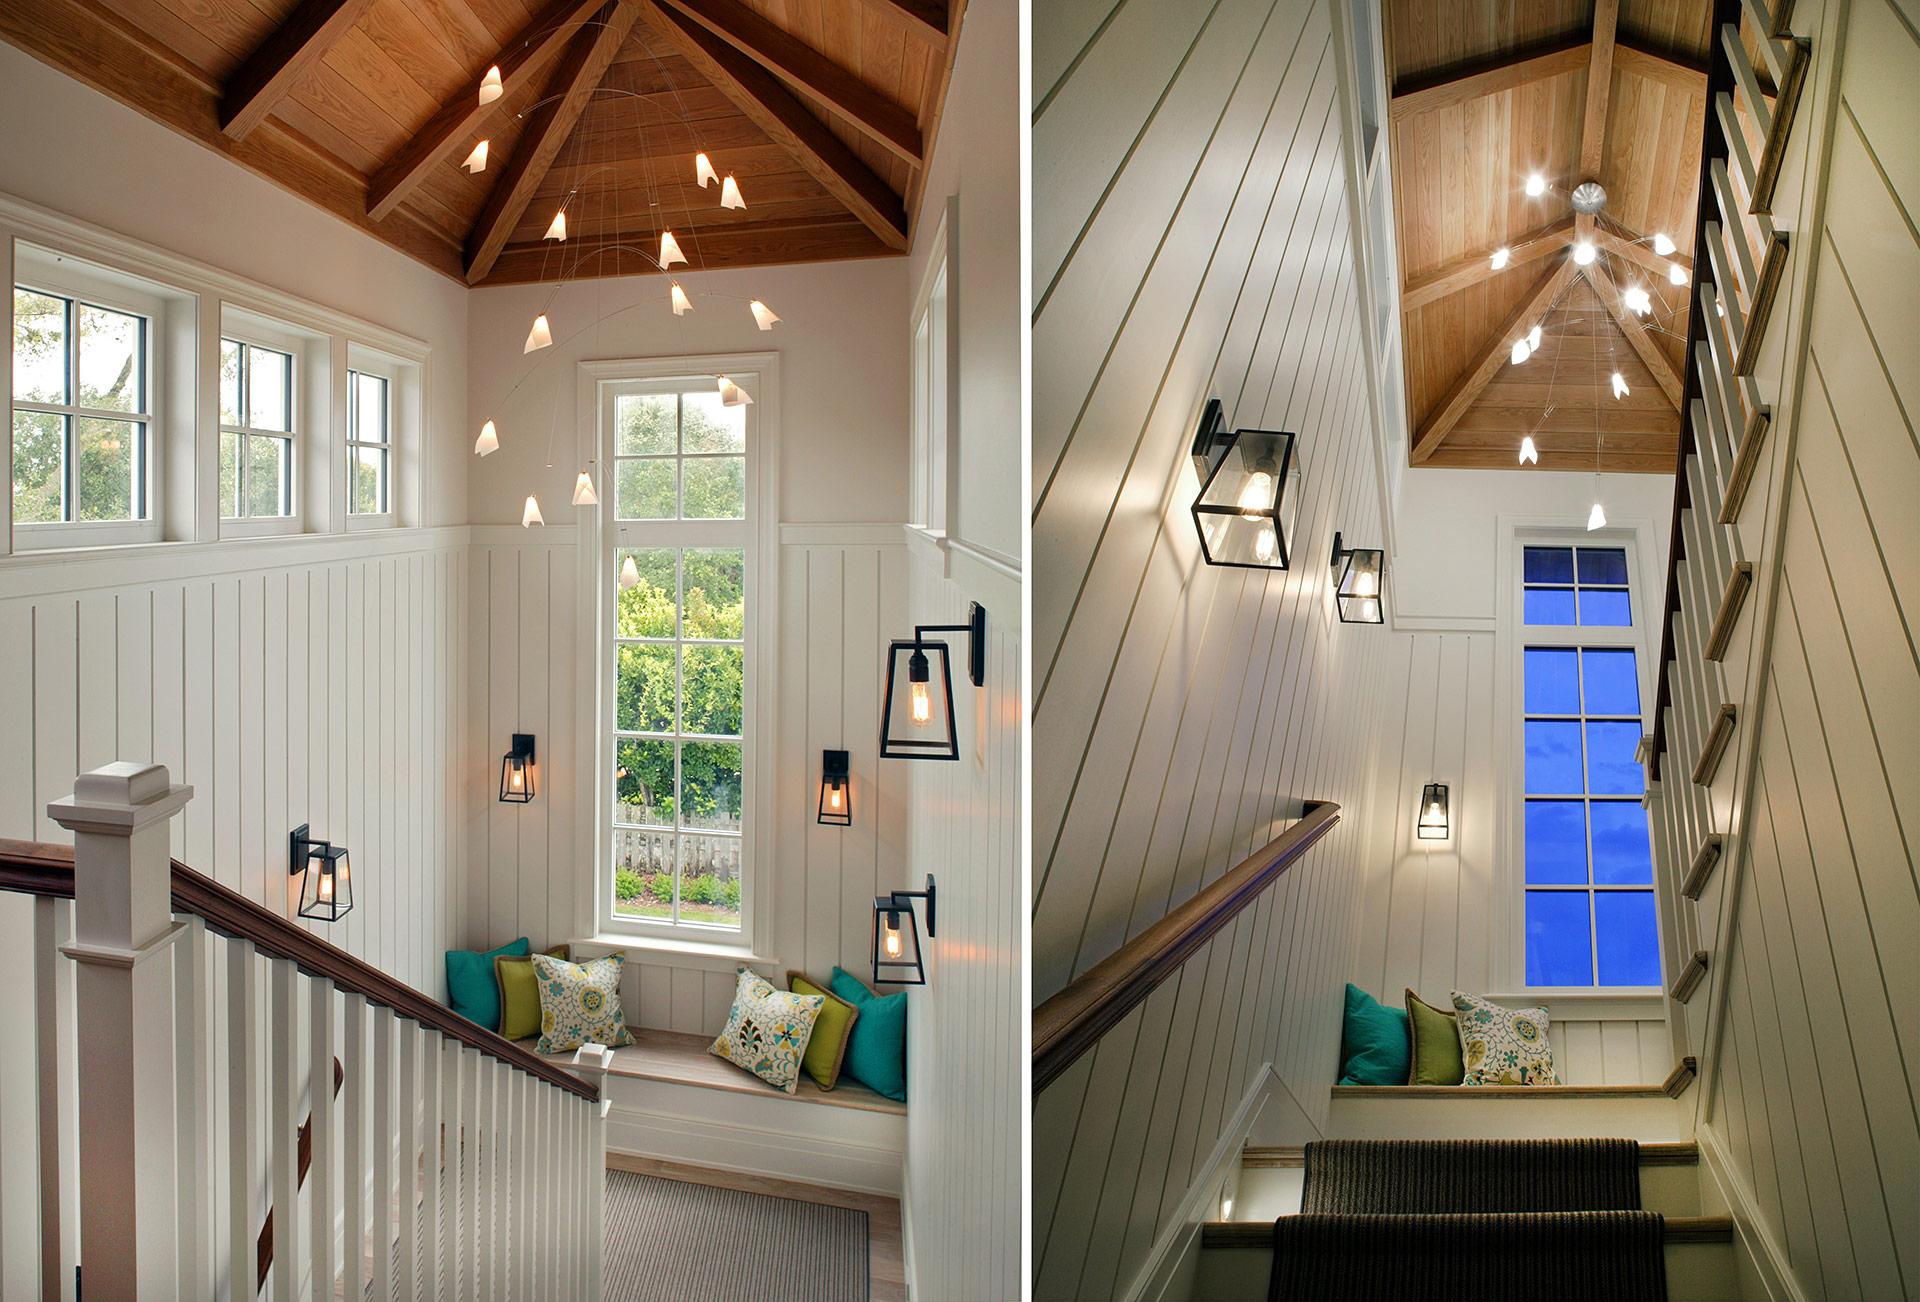 Likeable Beach Home Interior Design Of Luxury Theme Jacksonville Fl